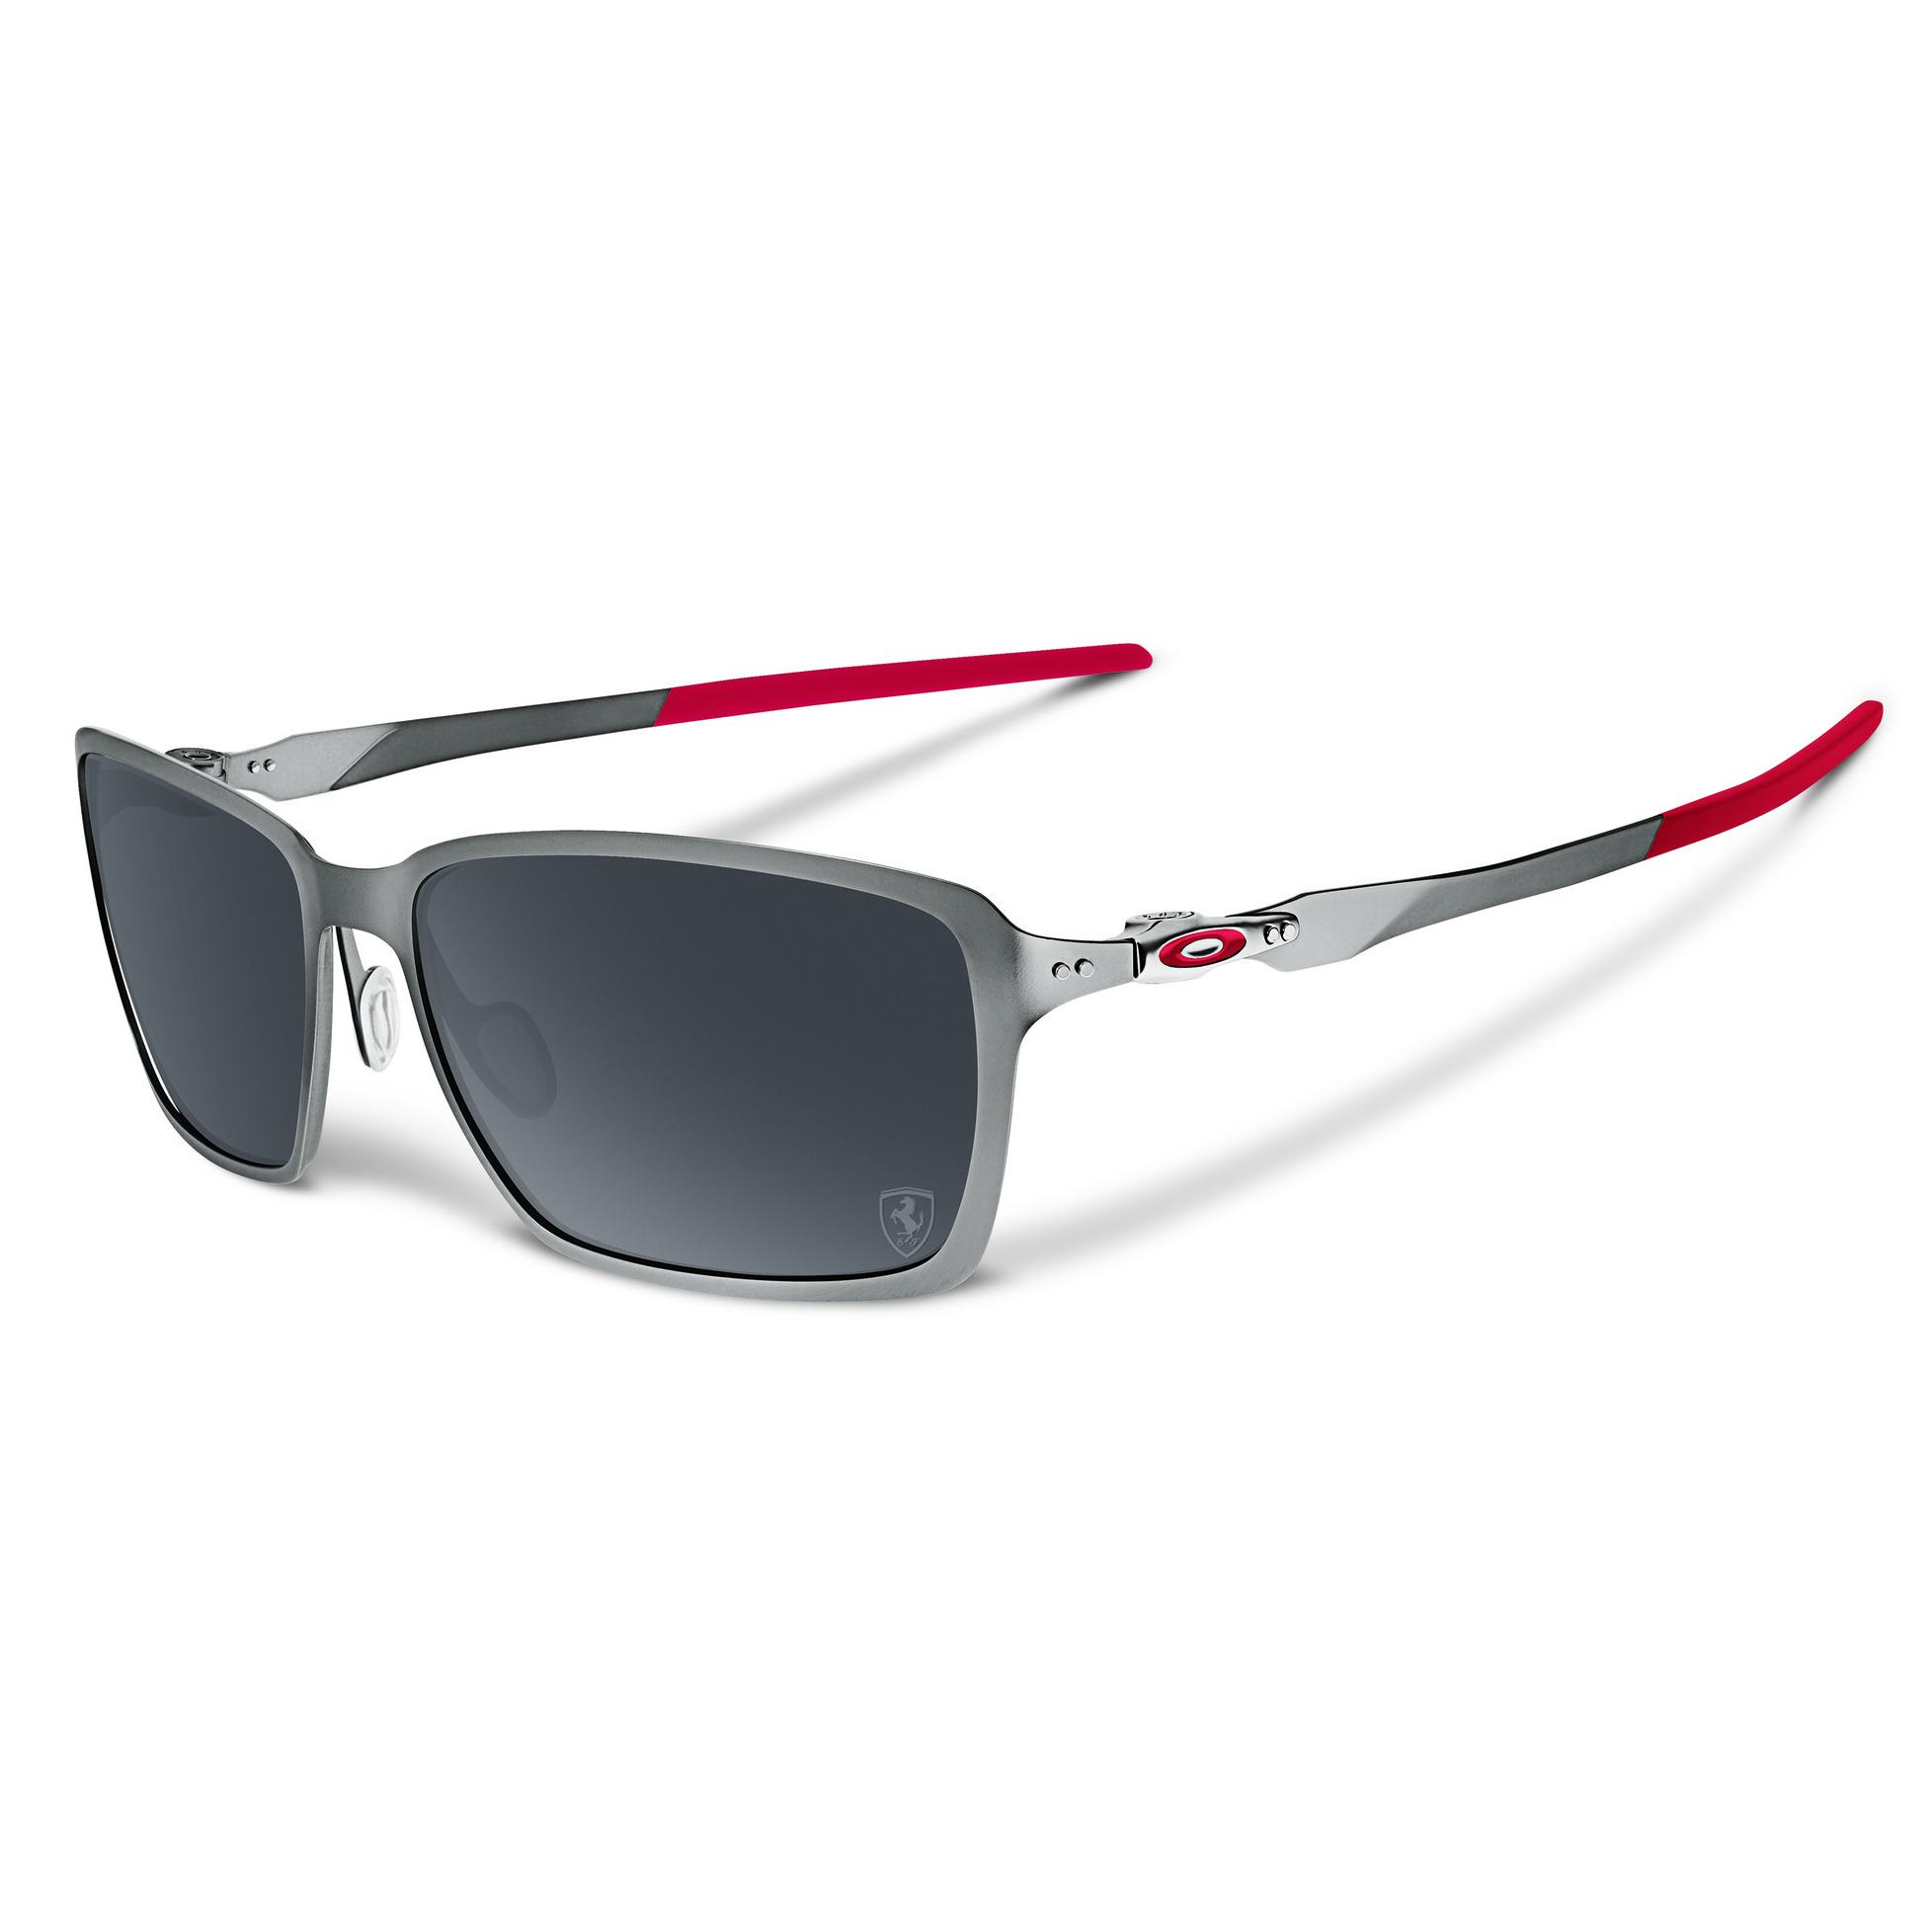 Scuderia Ferrari OAKLEY Tincan Sunglasses